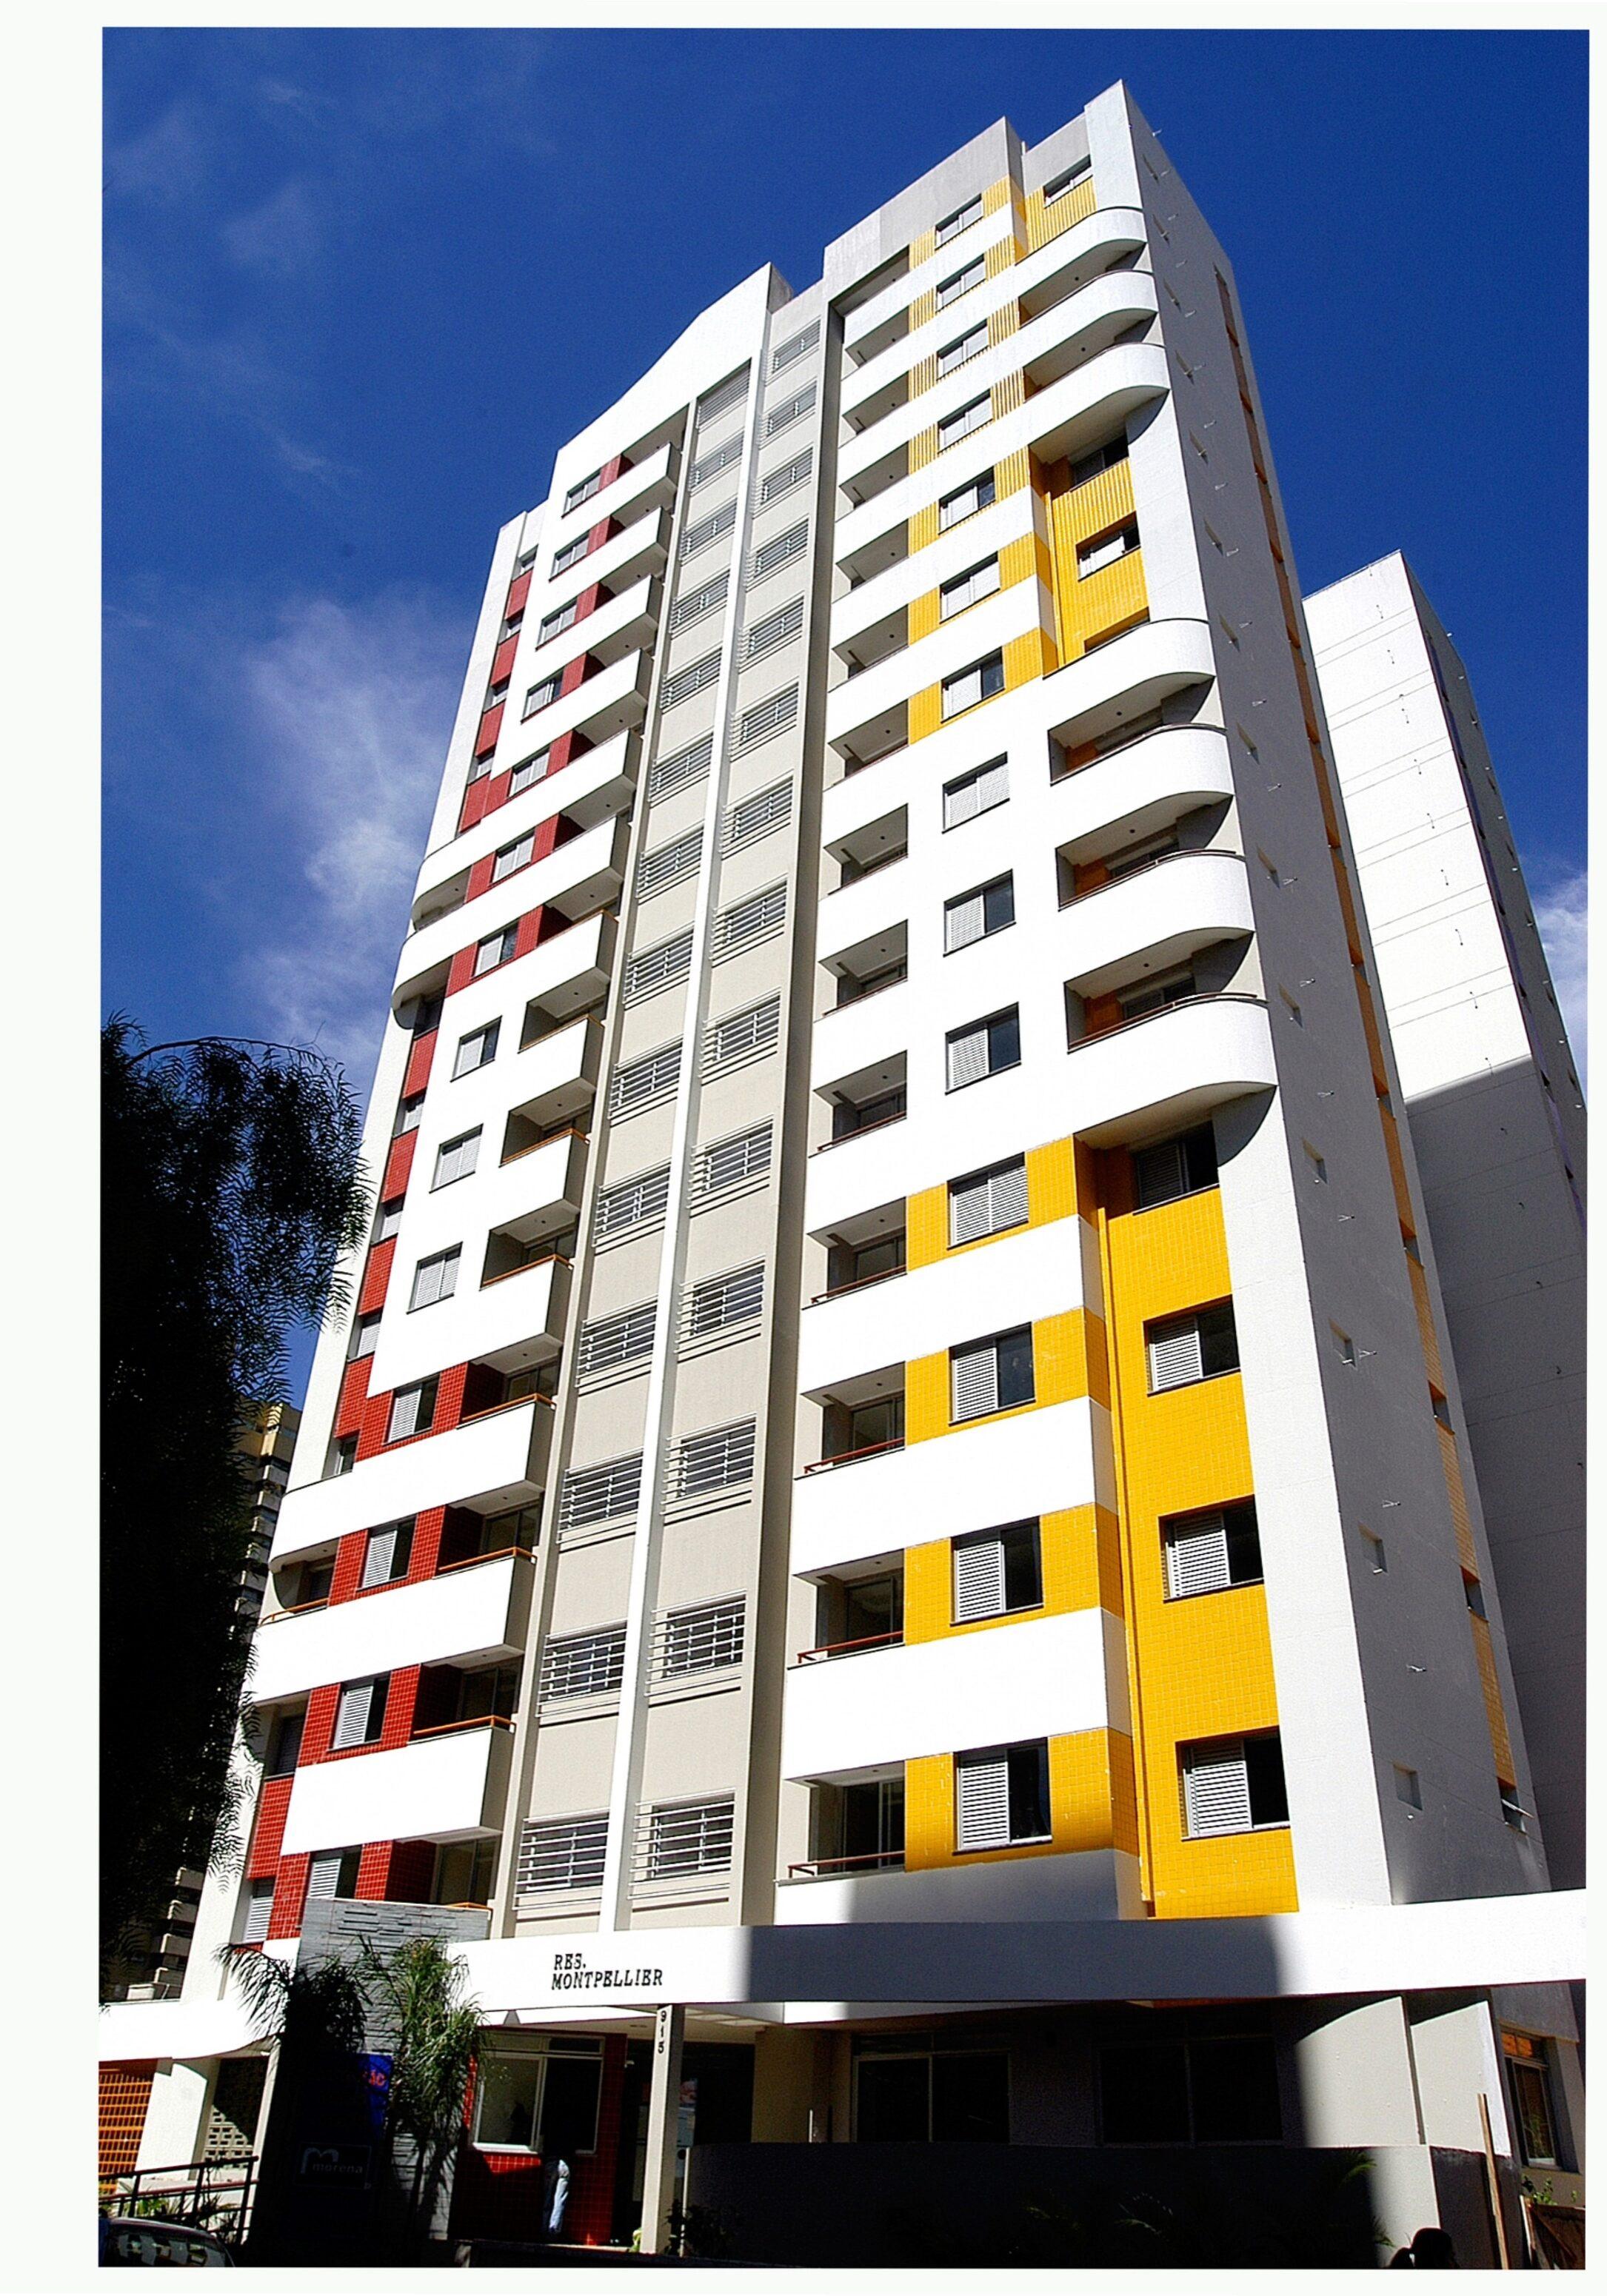 residencial montpellier (londrina-pr)